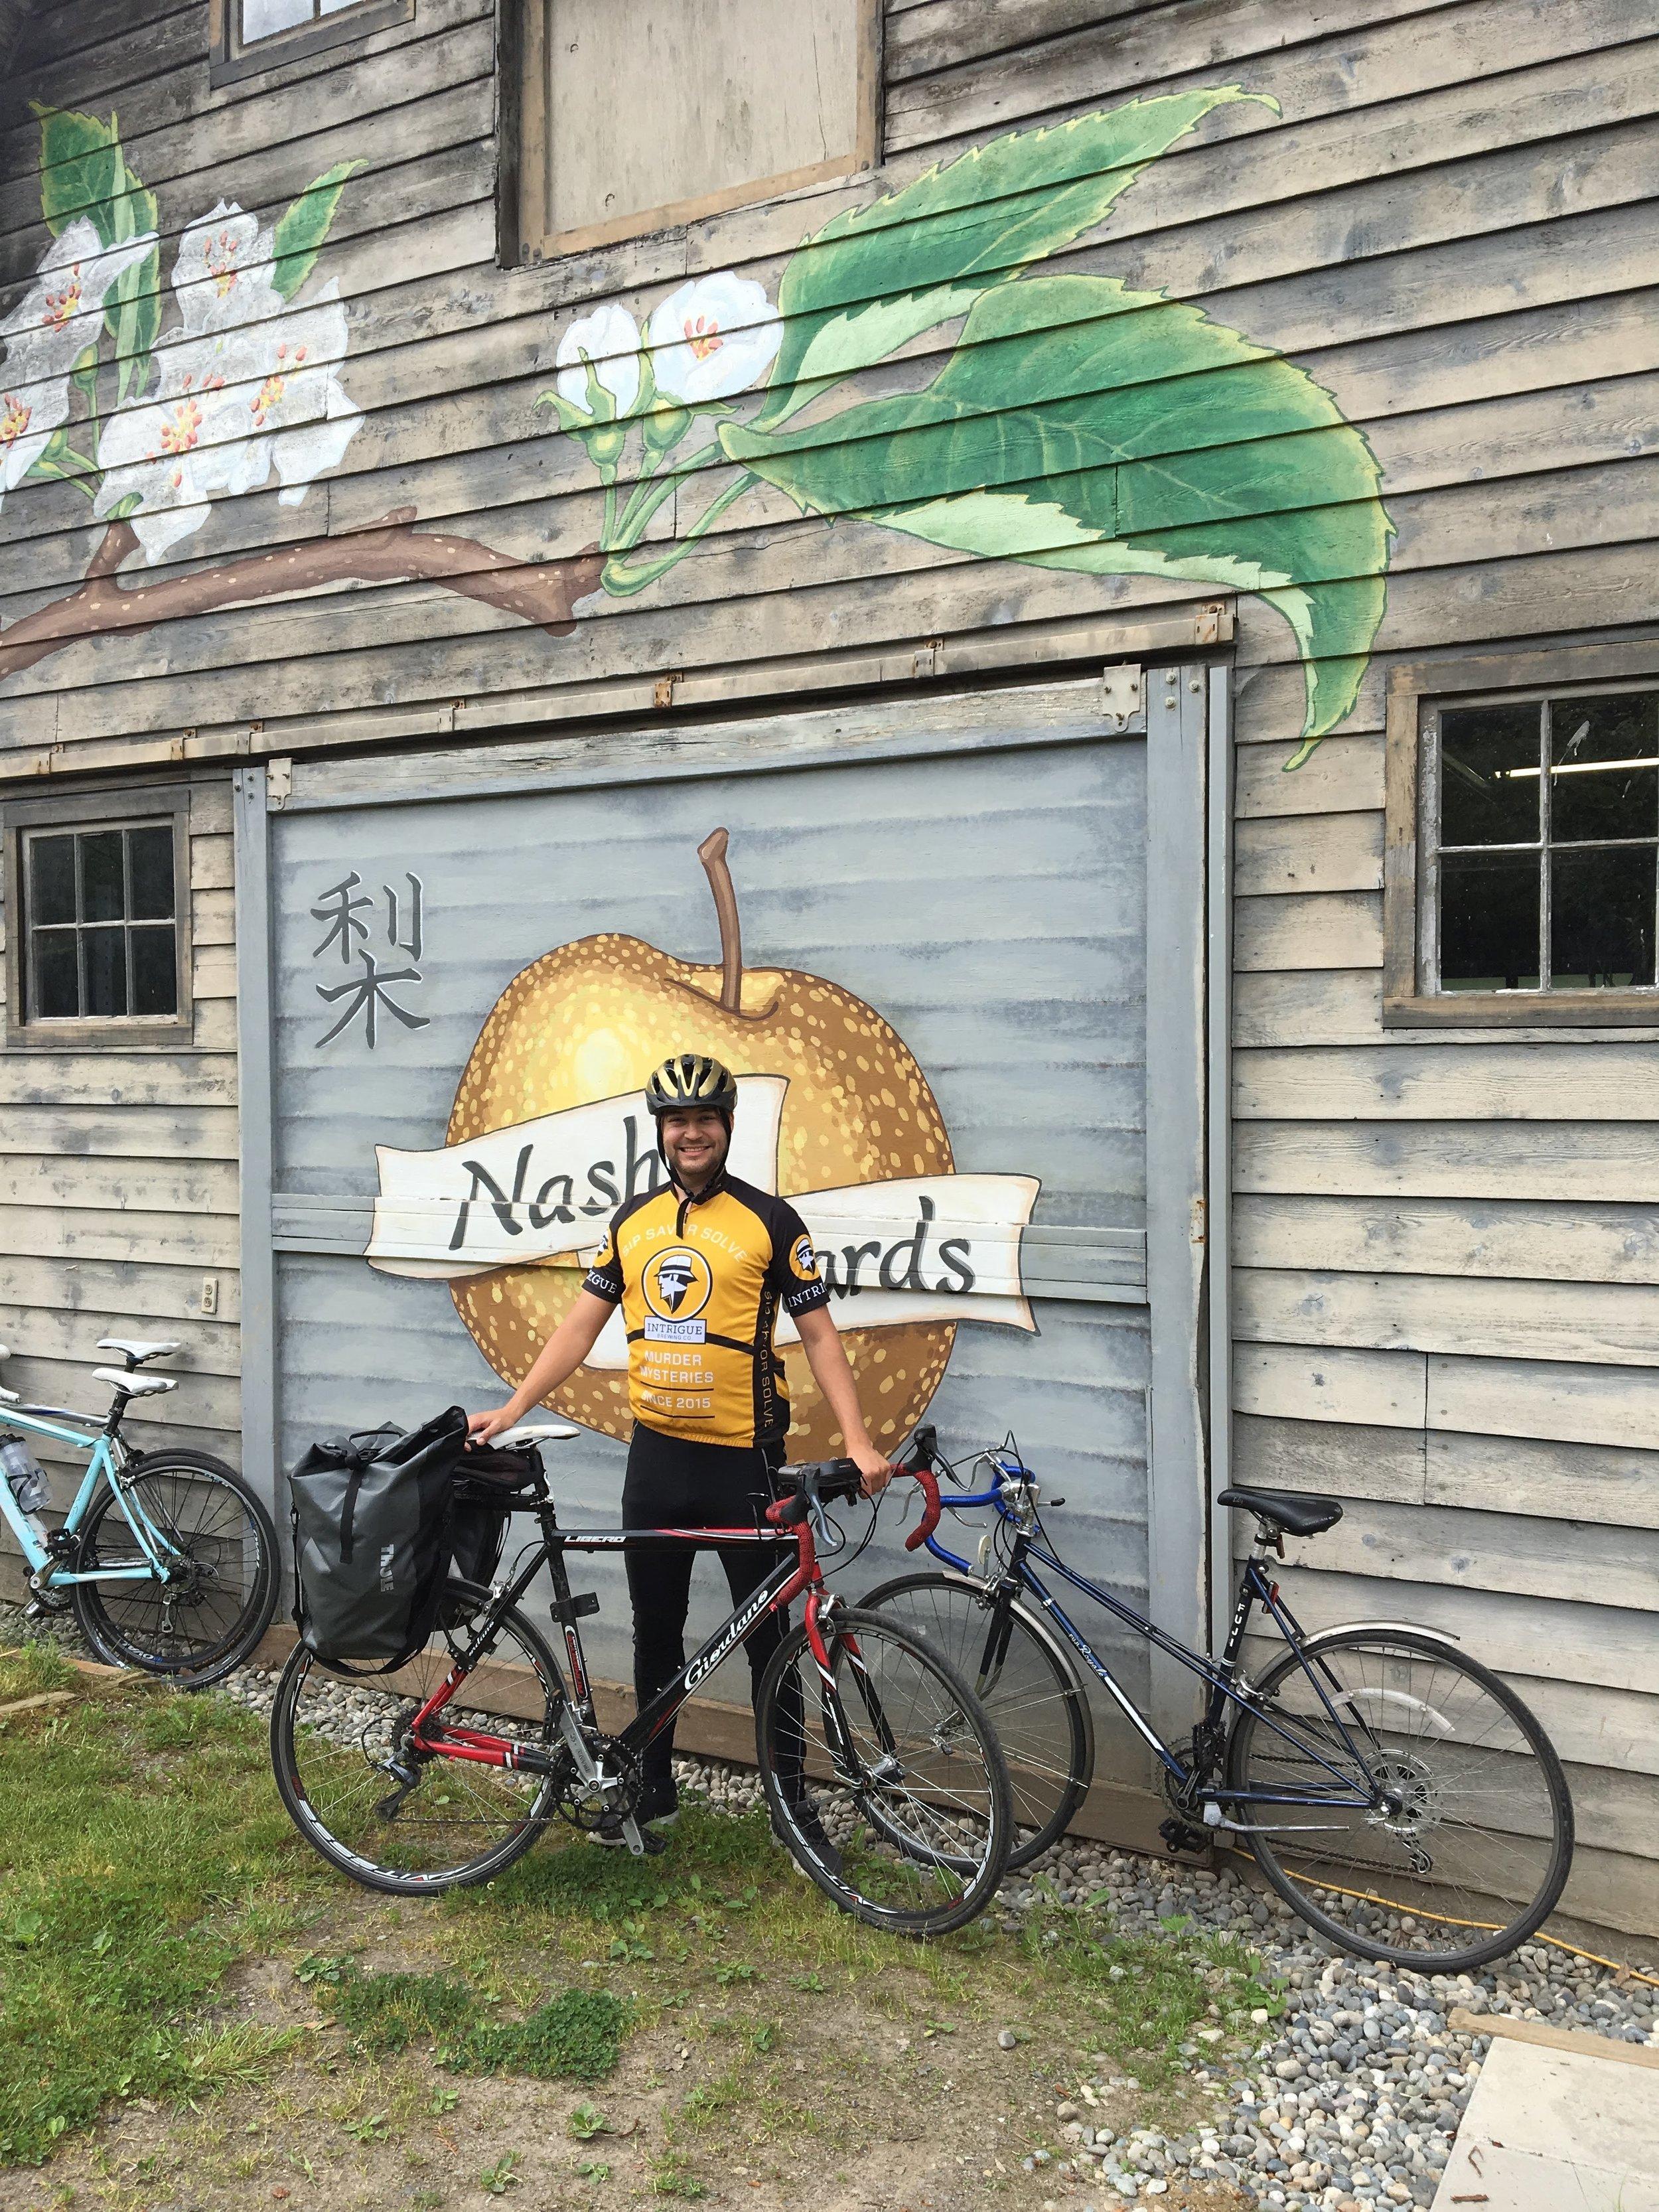 A major biking destination, apparently